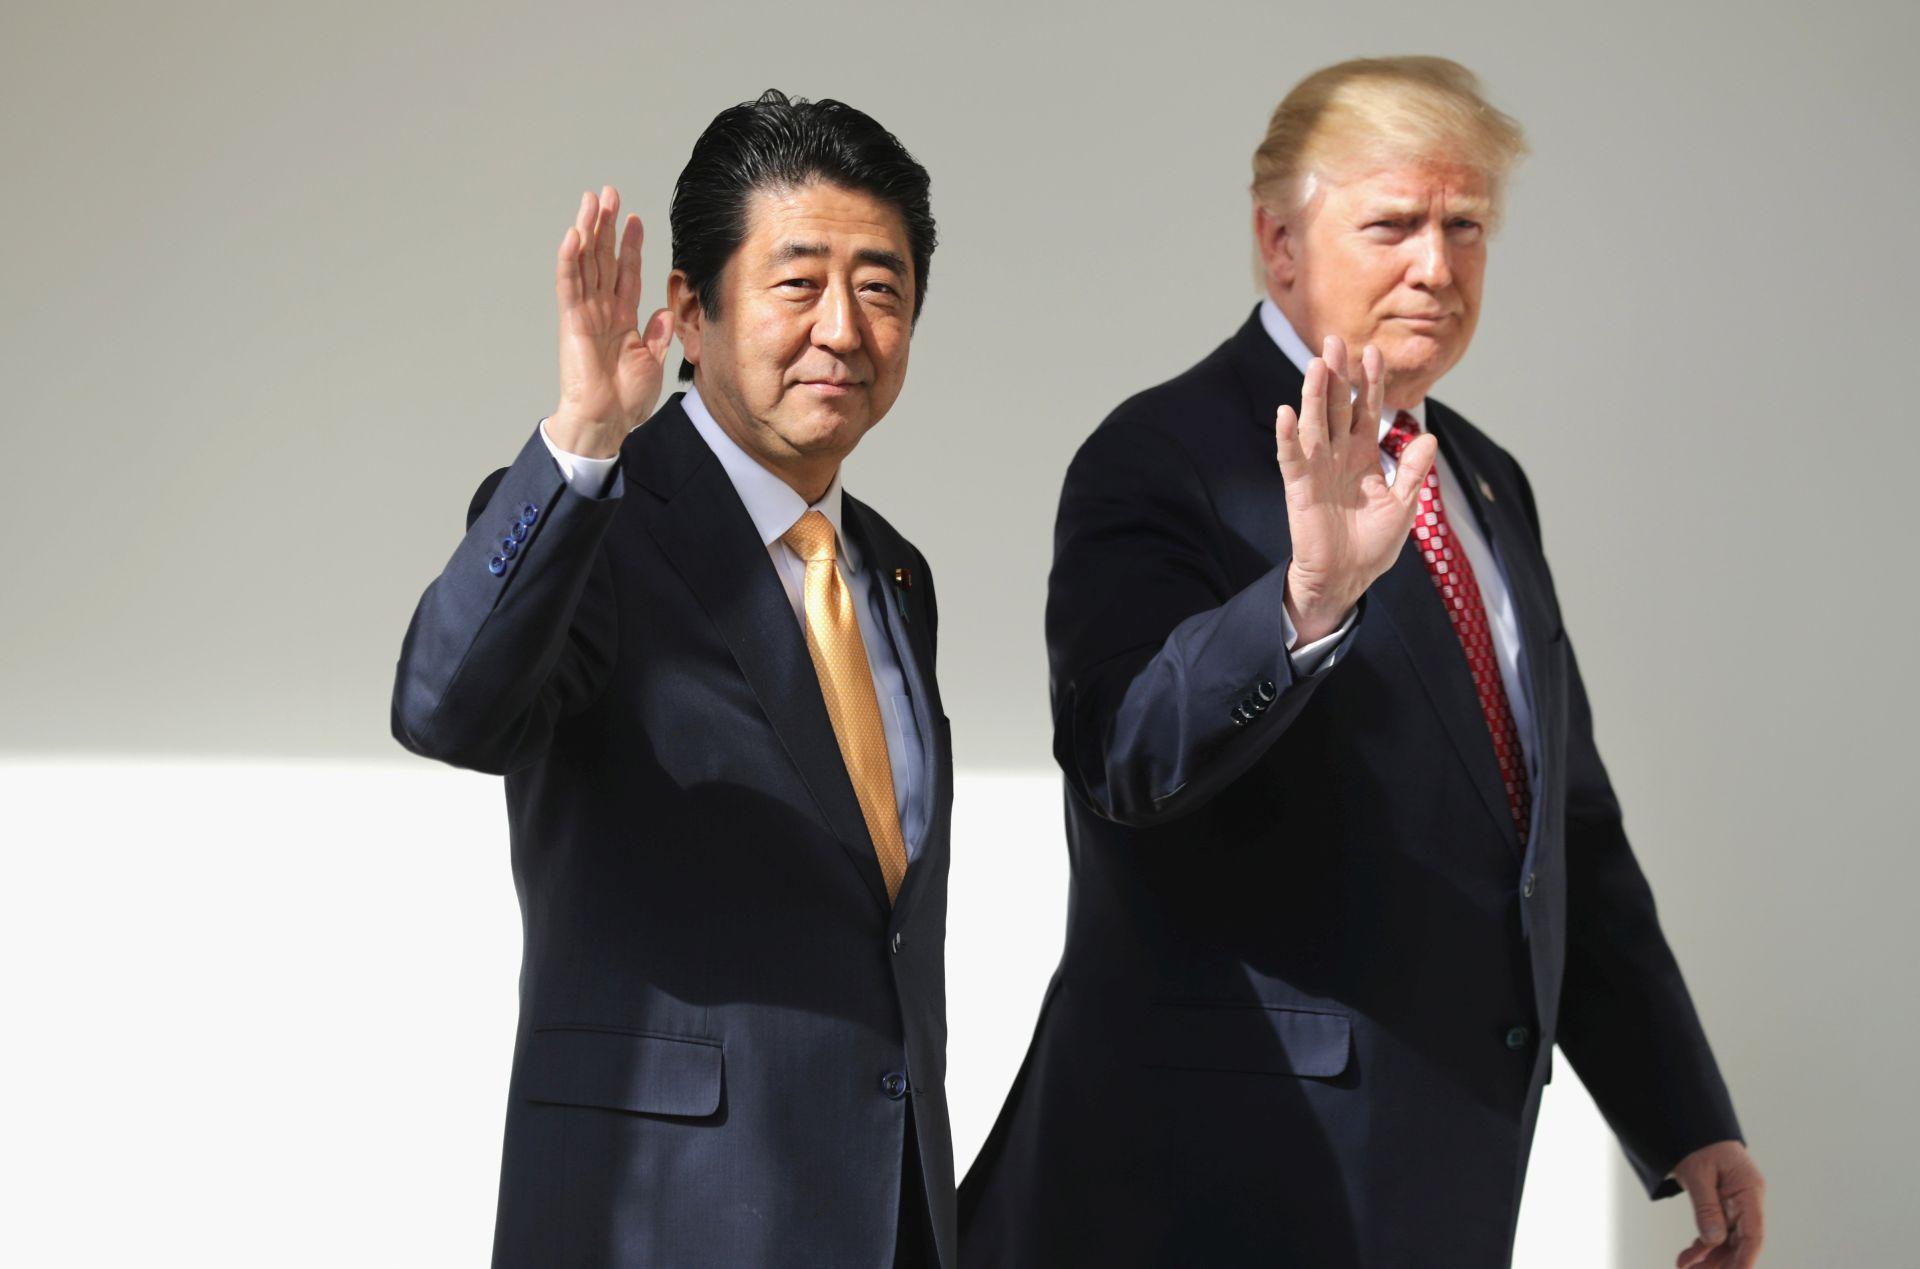 VIDEO: Japanski premijer Shinzo Abe ponovo na razgovorima kod Donalda Trumpa